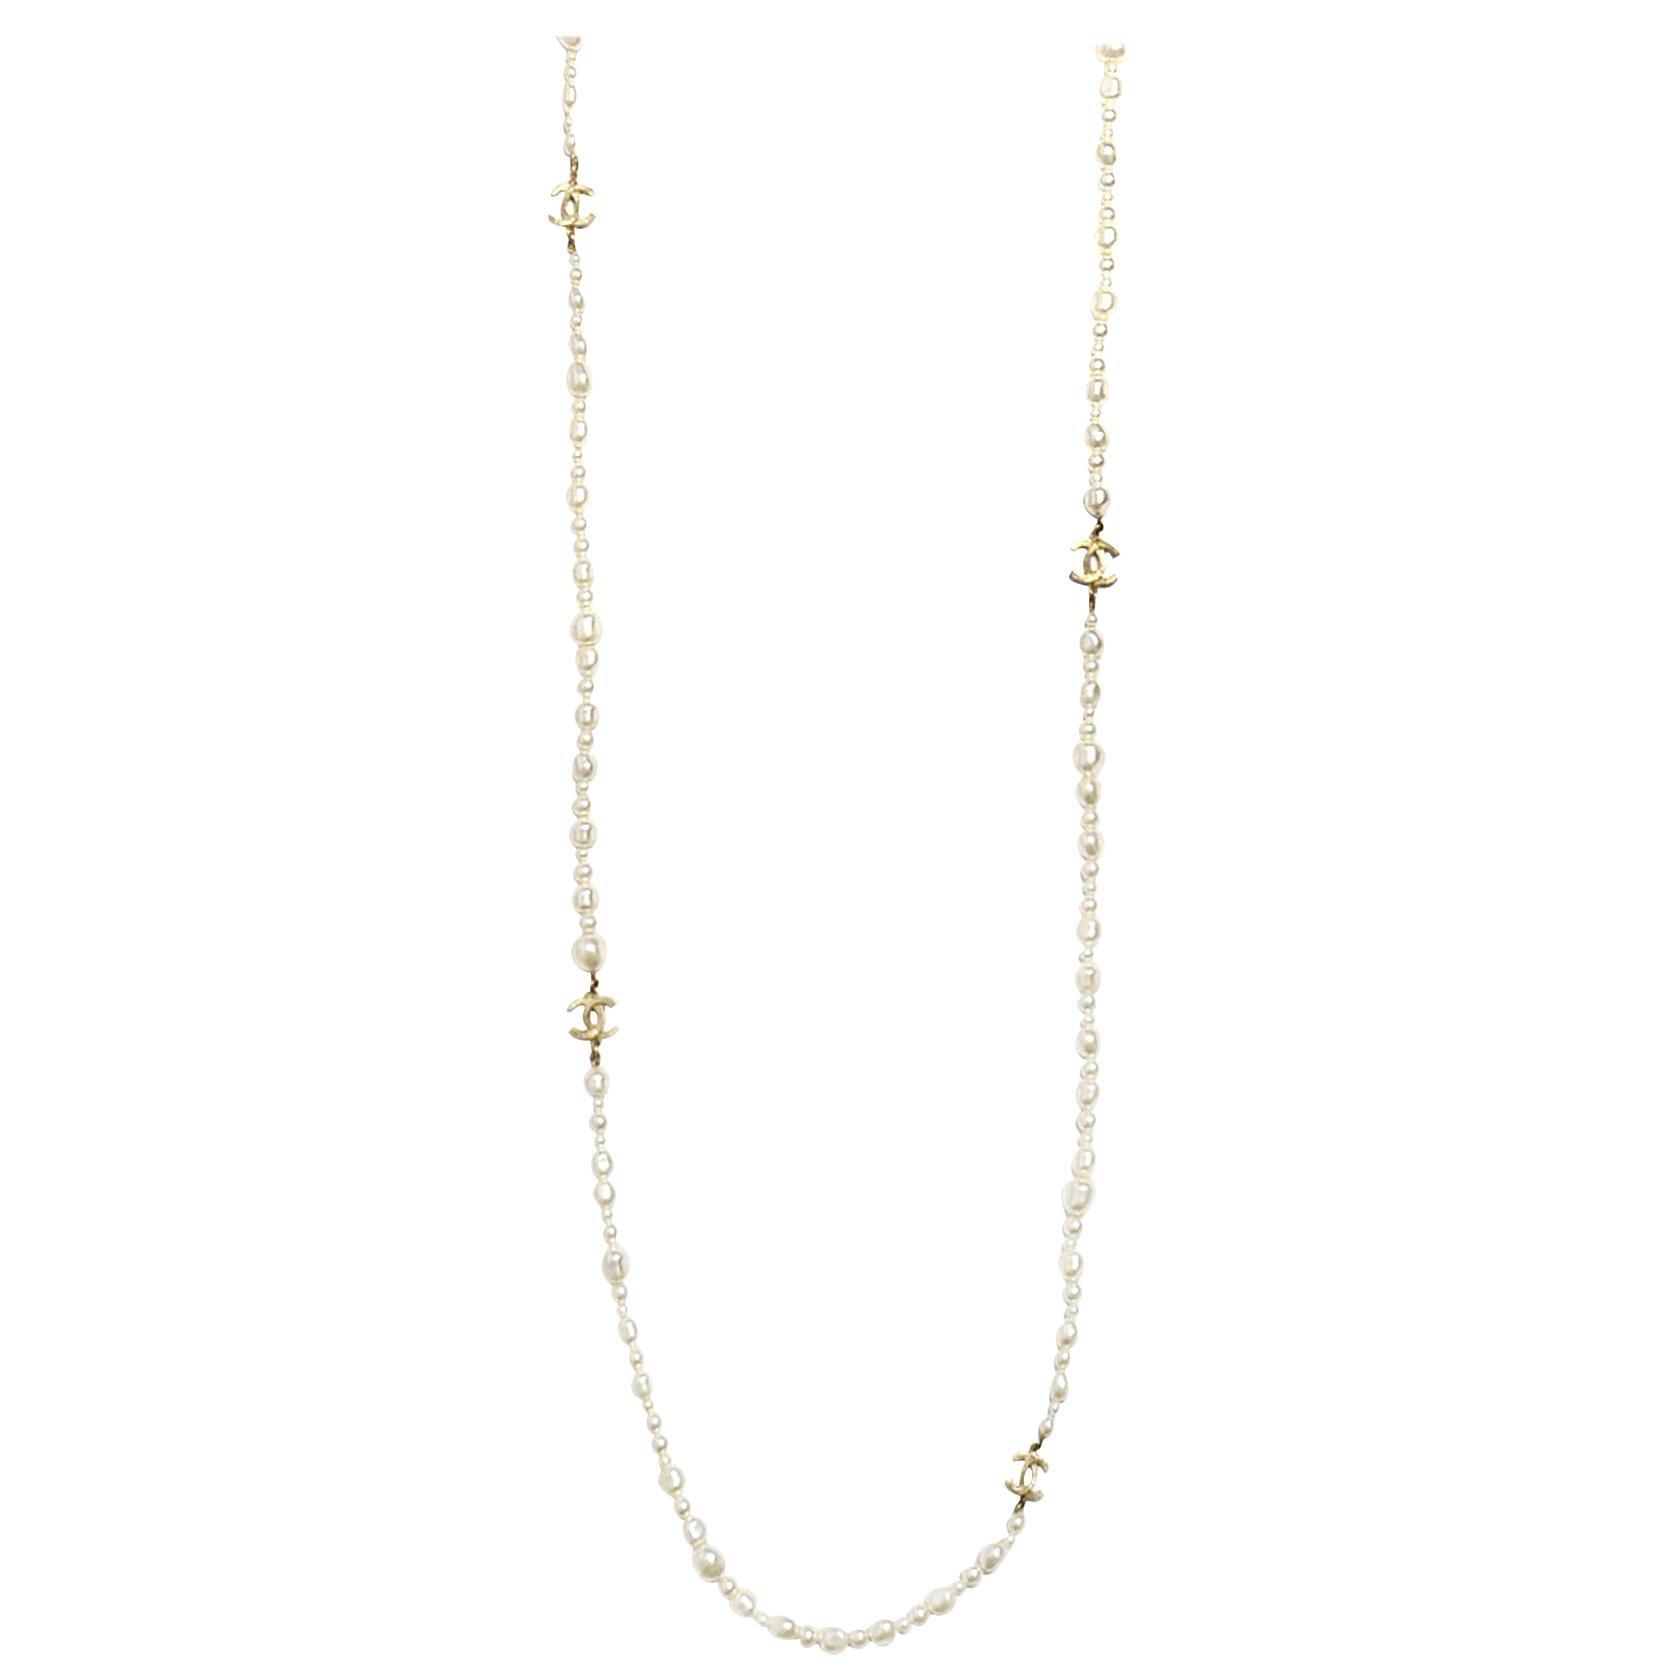 5b59f43839 Vintage Link Necklaces For Sale in USA - 1stdibs